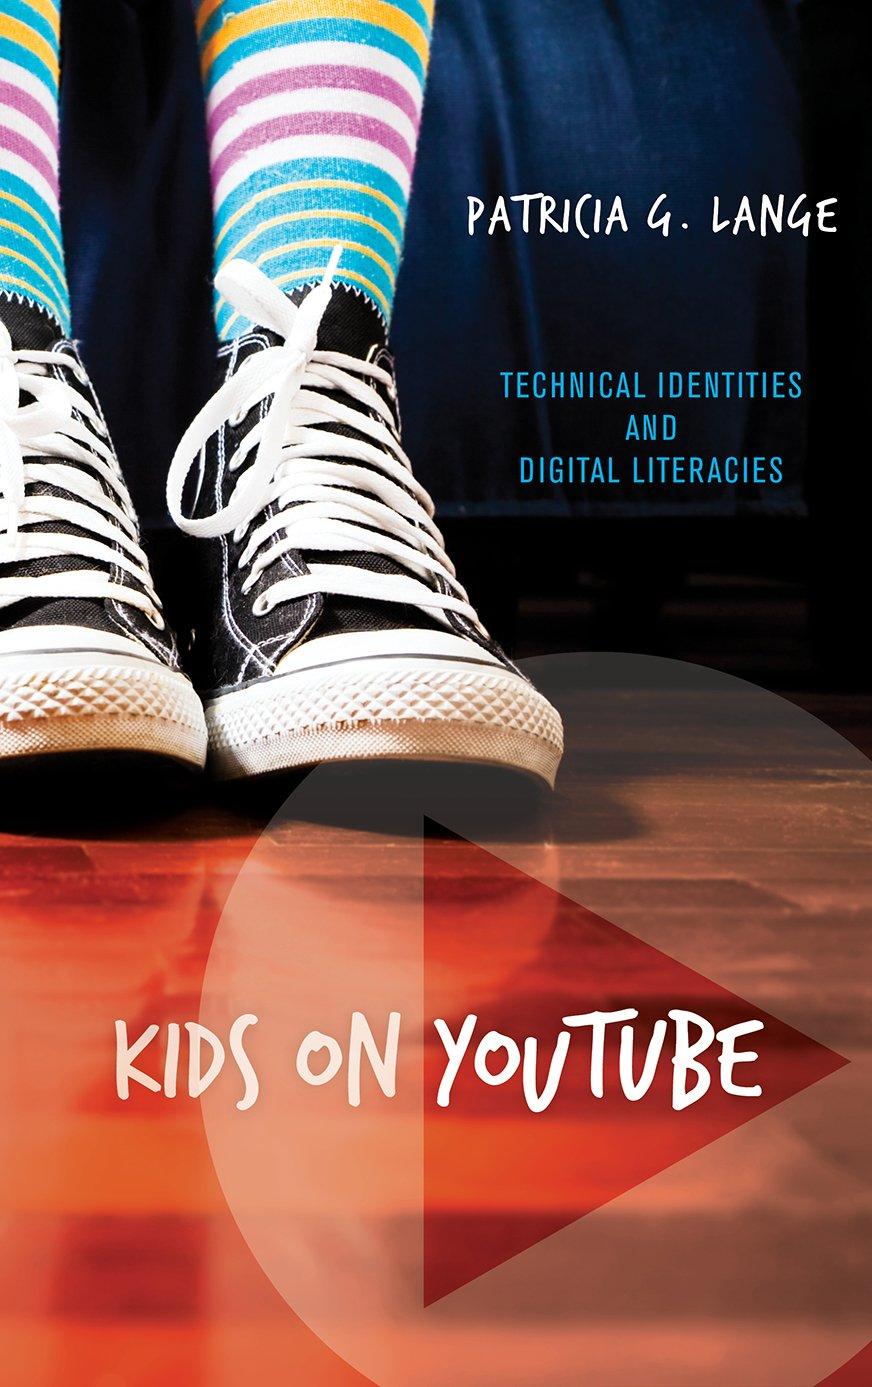 Kids on YouTube: Technical Identities and Digital Literacies: Amazon.es: Patricia G Lange: Libros en idiomas extranjeros